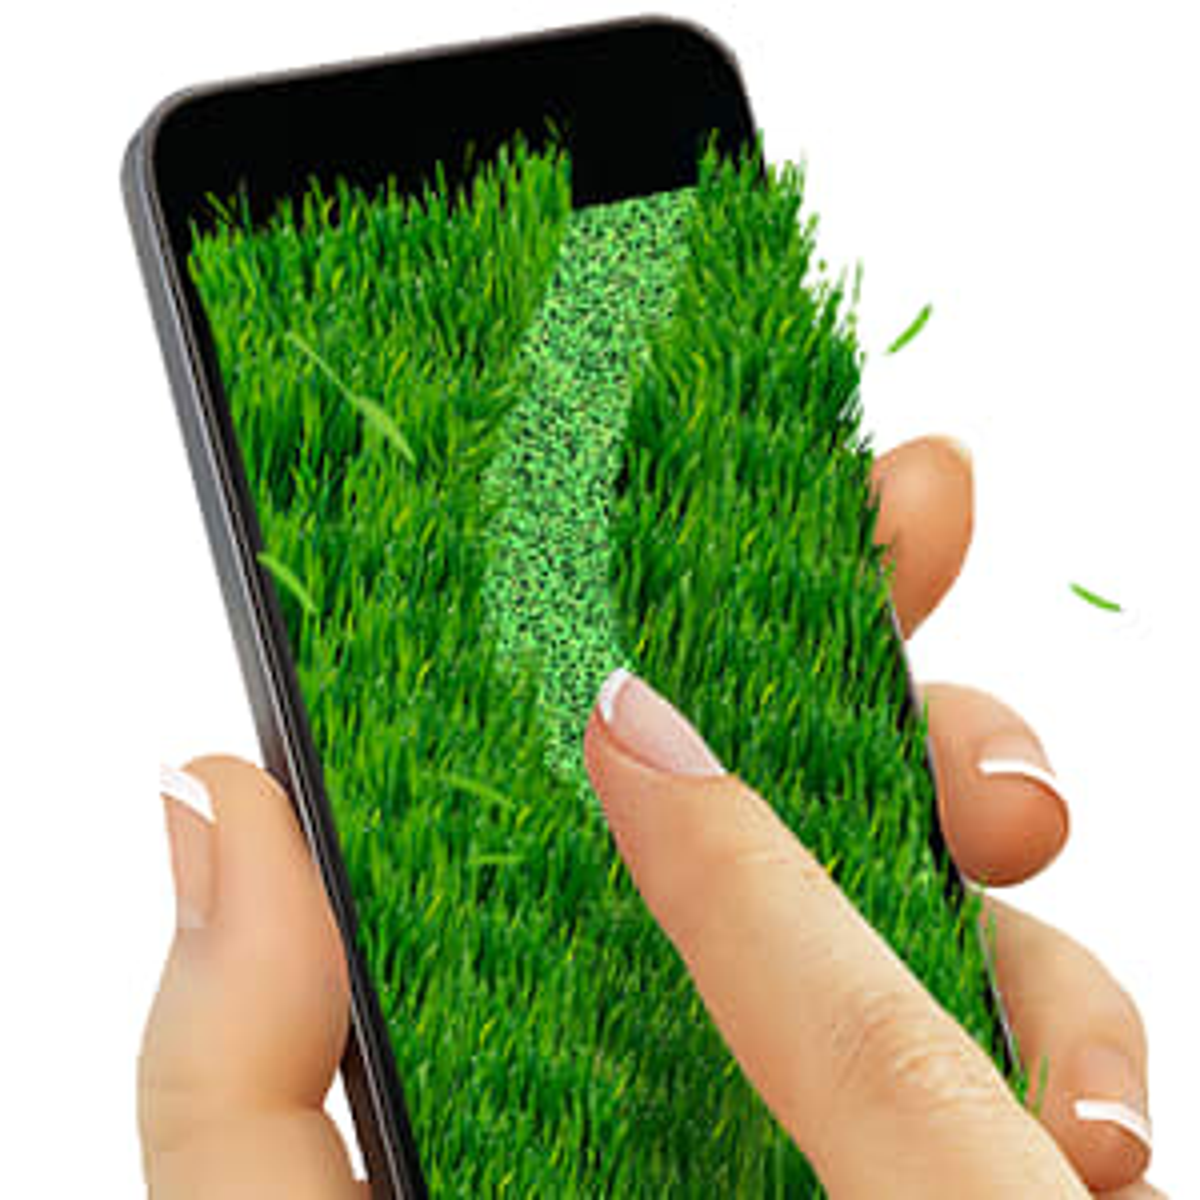 Lawnmower: writing on grass 1.3